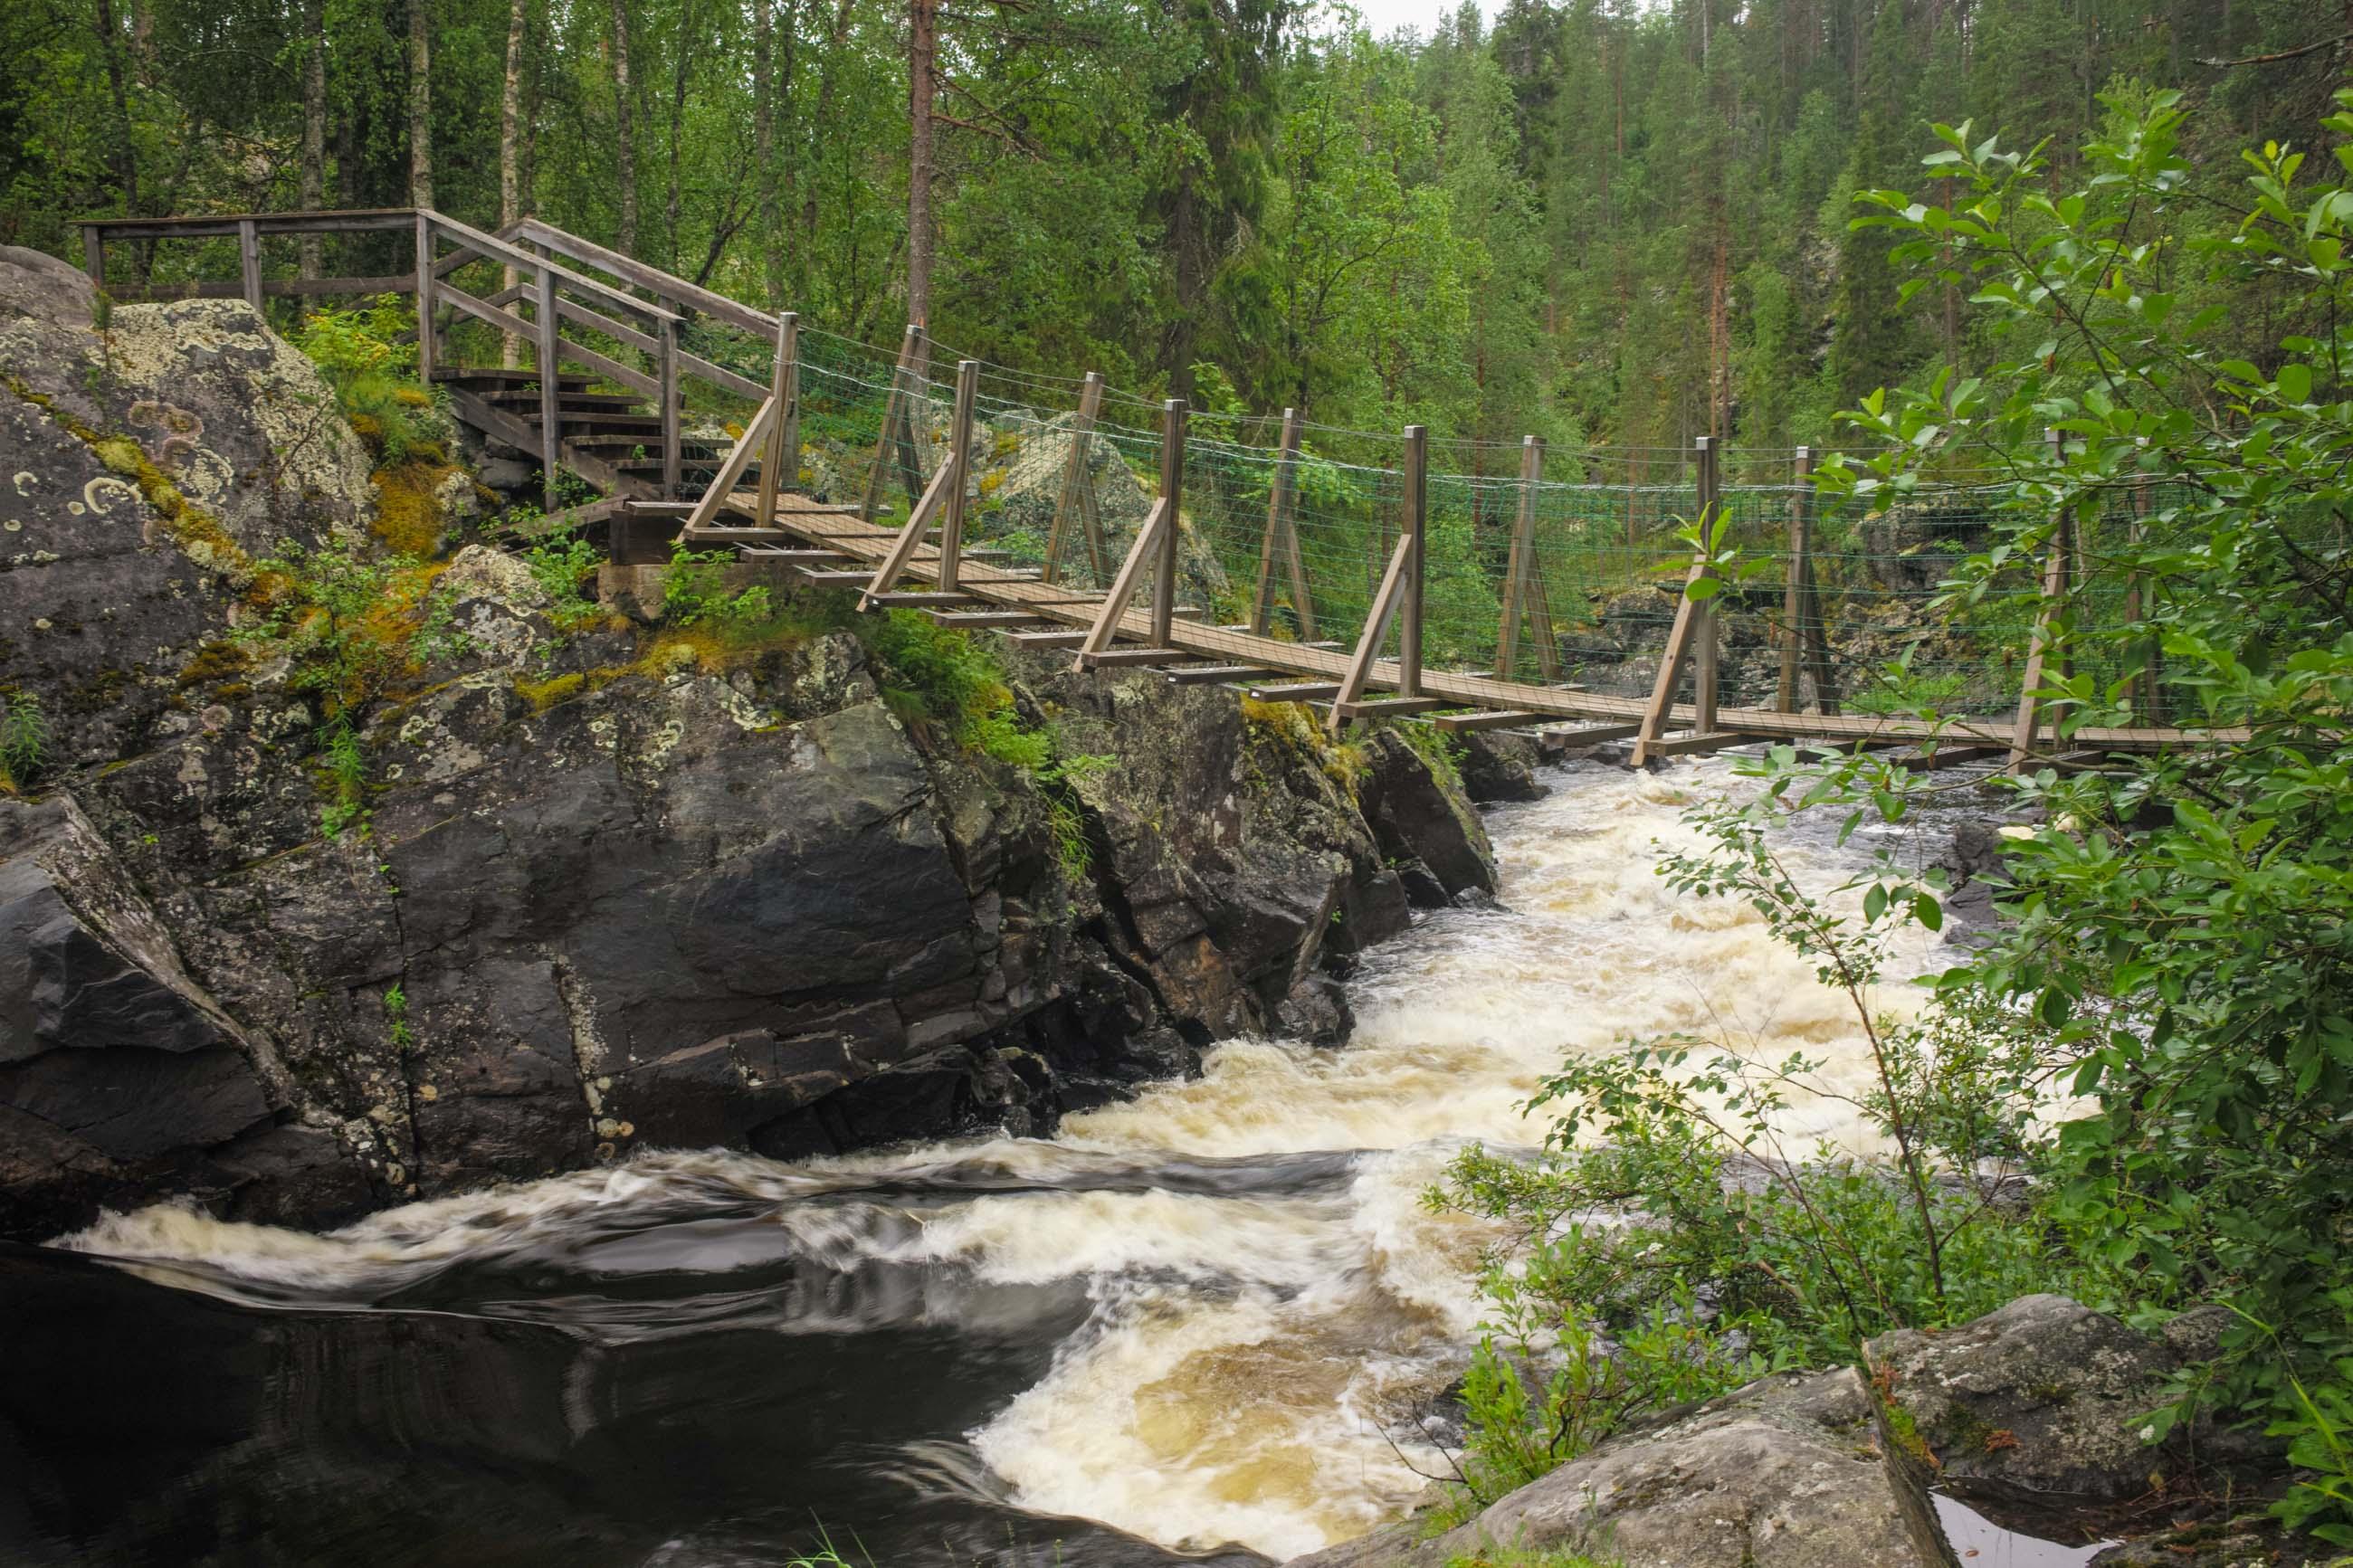 https://bubo.sk/uploads/galleries/18847/lubosfellner_finsko_polarnykruh-8-.jpg